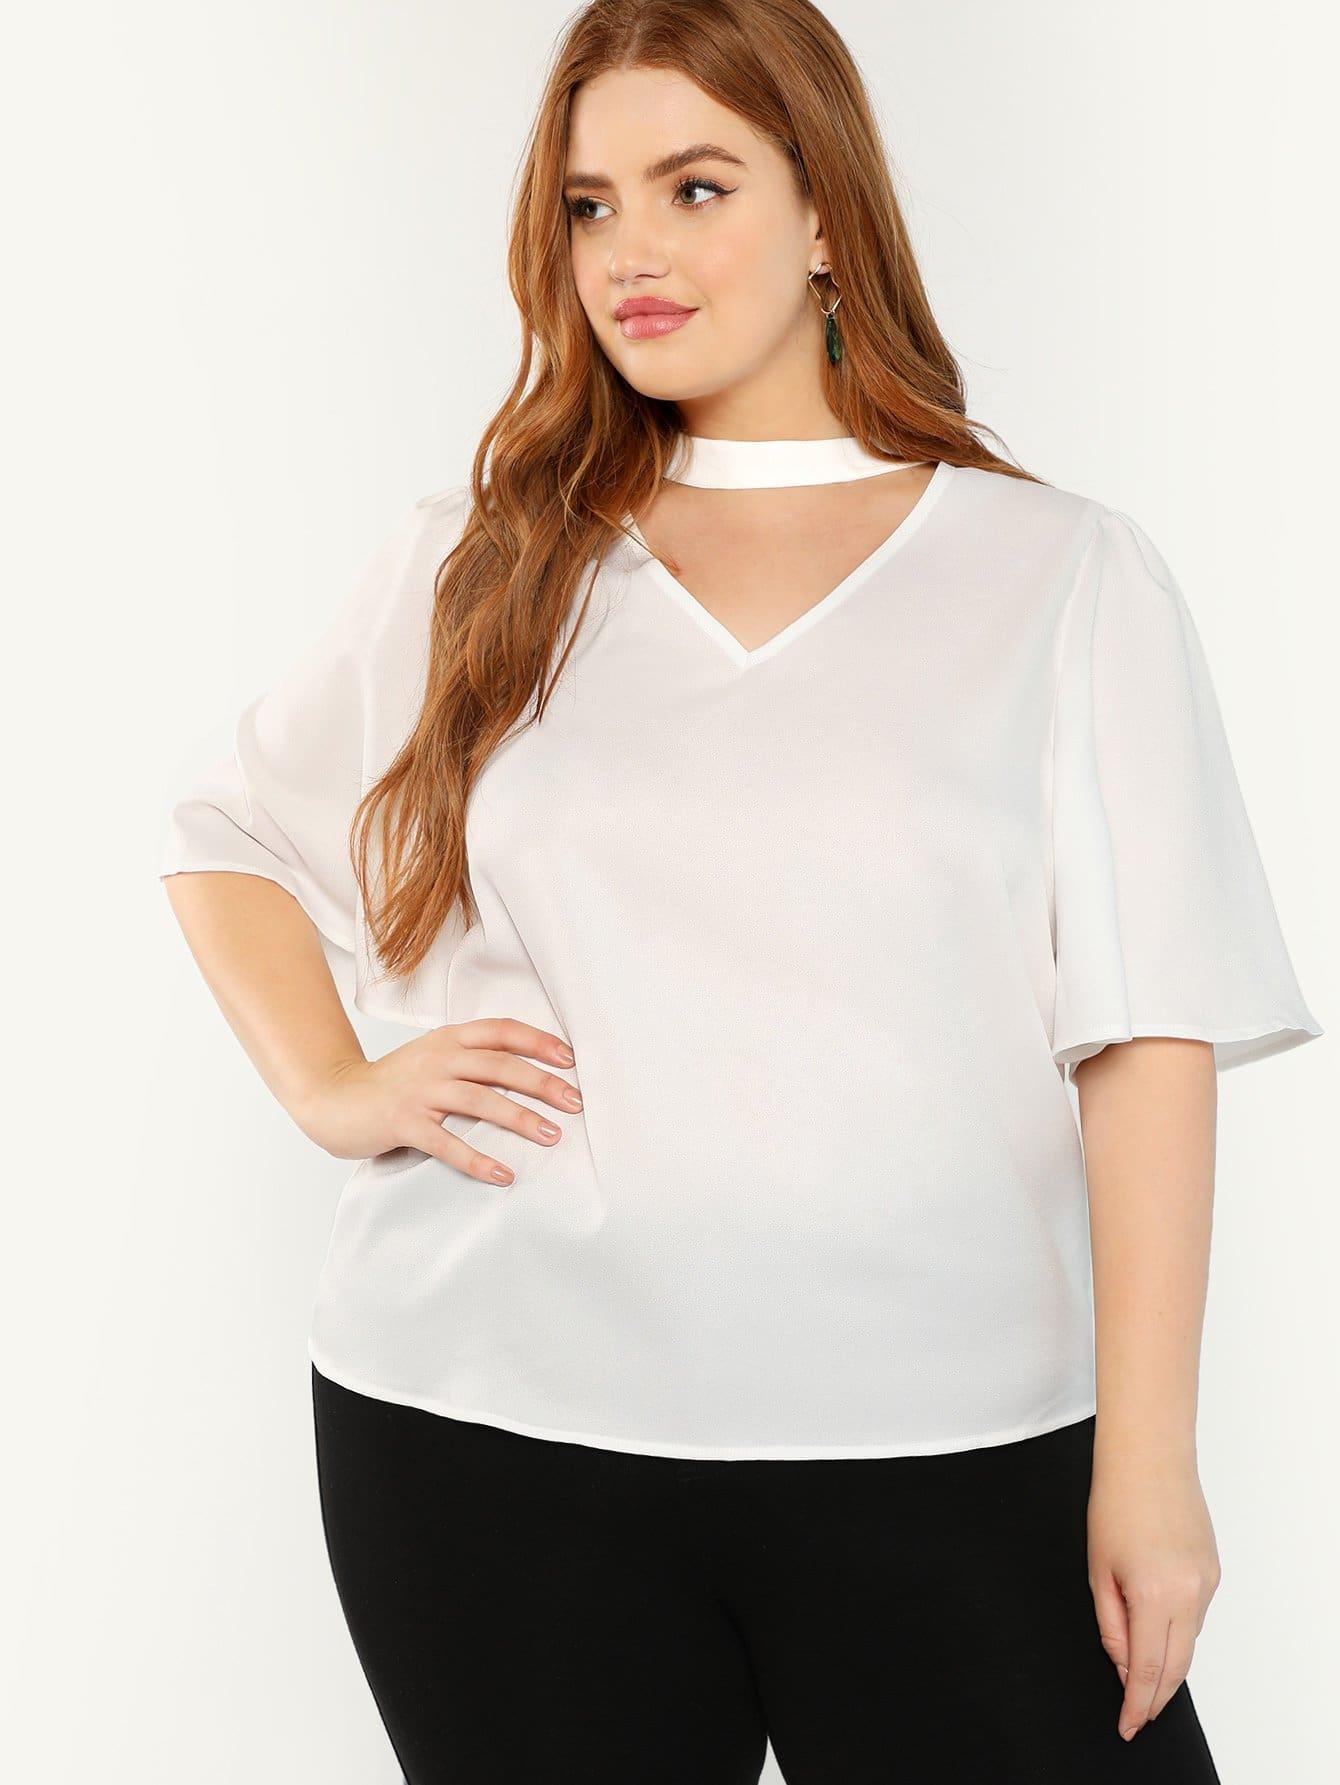 Купить Плюс размеры чокер шея блузка с оборками рукавами, Bree Kish, SheIn